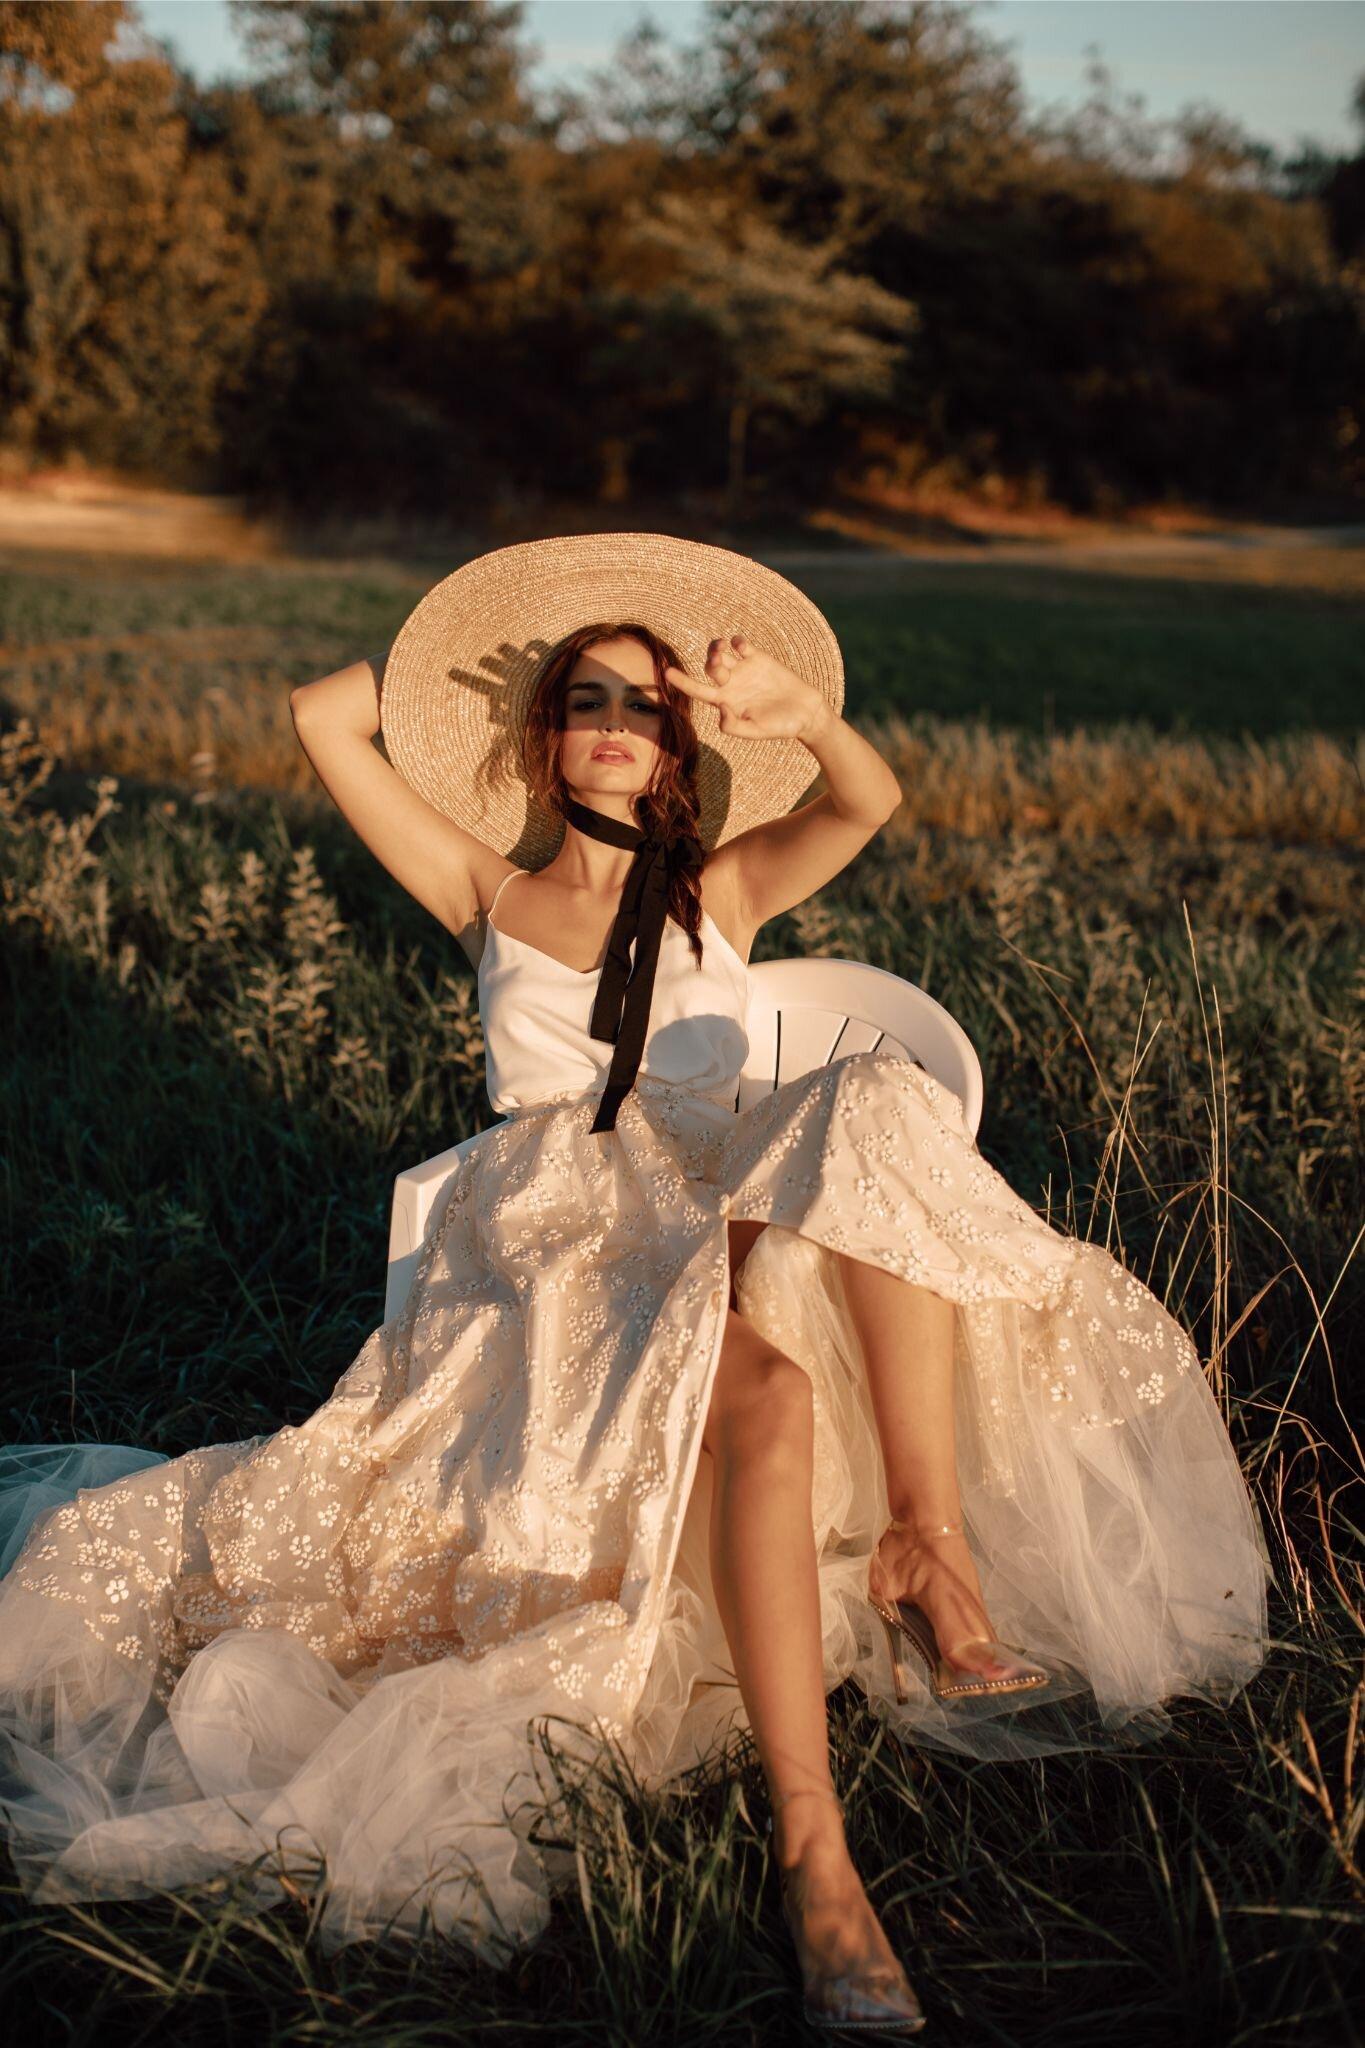 the-saums-bebas-closet-germaine-skirt-summer-bride-fashion-editorial-12.jpg